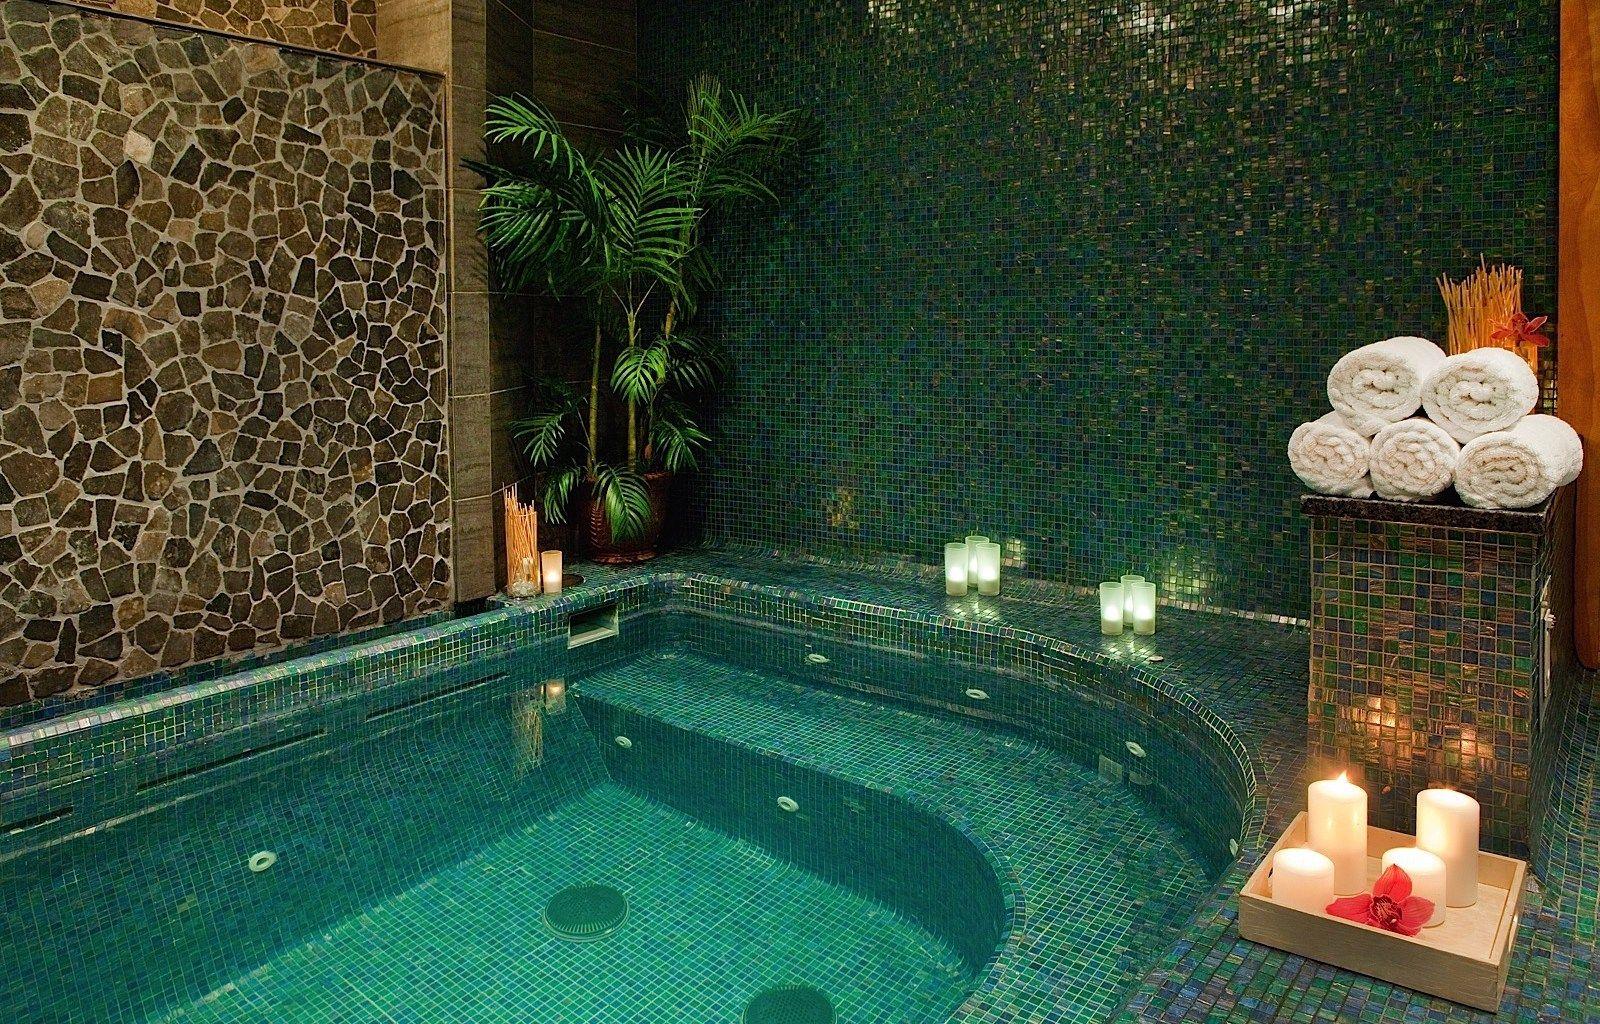 Portland regency hotel and spa 2018 world 39 s best hotels for Portland baths